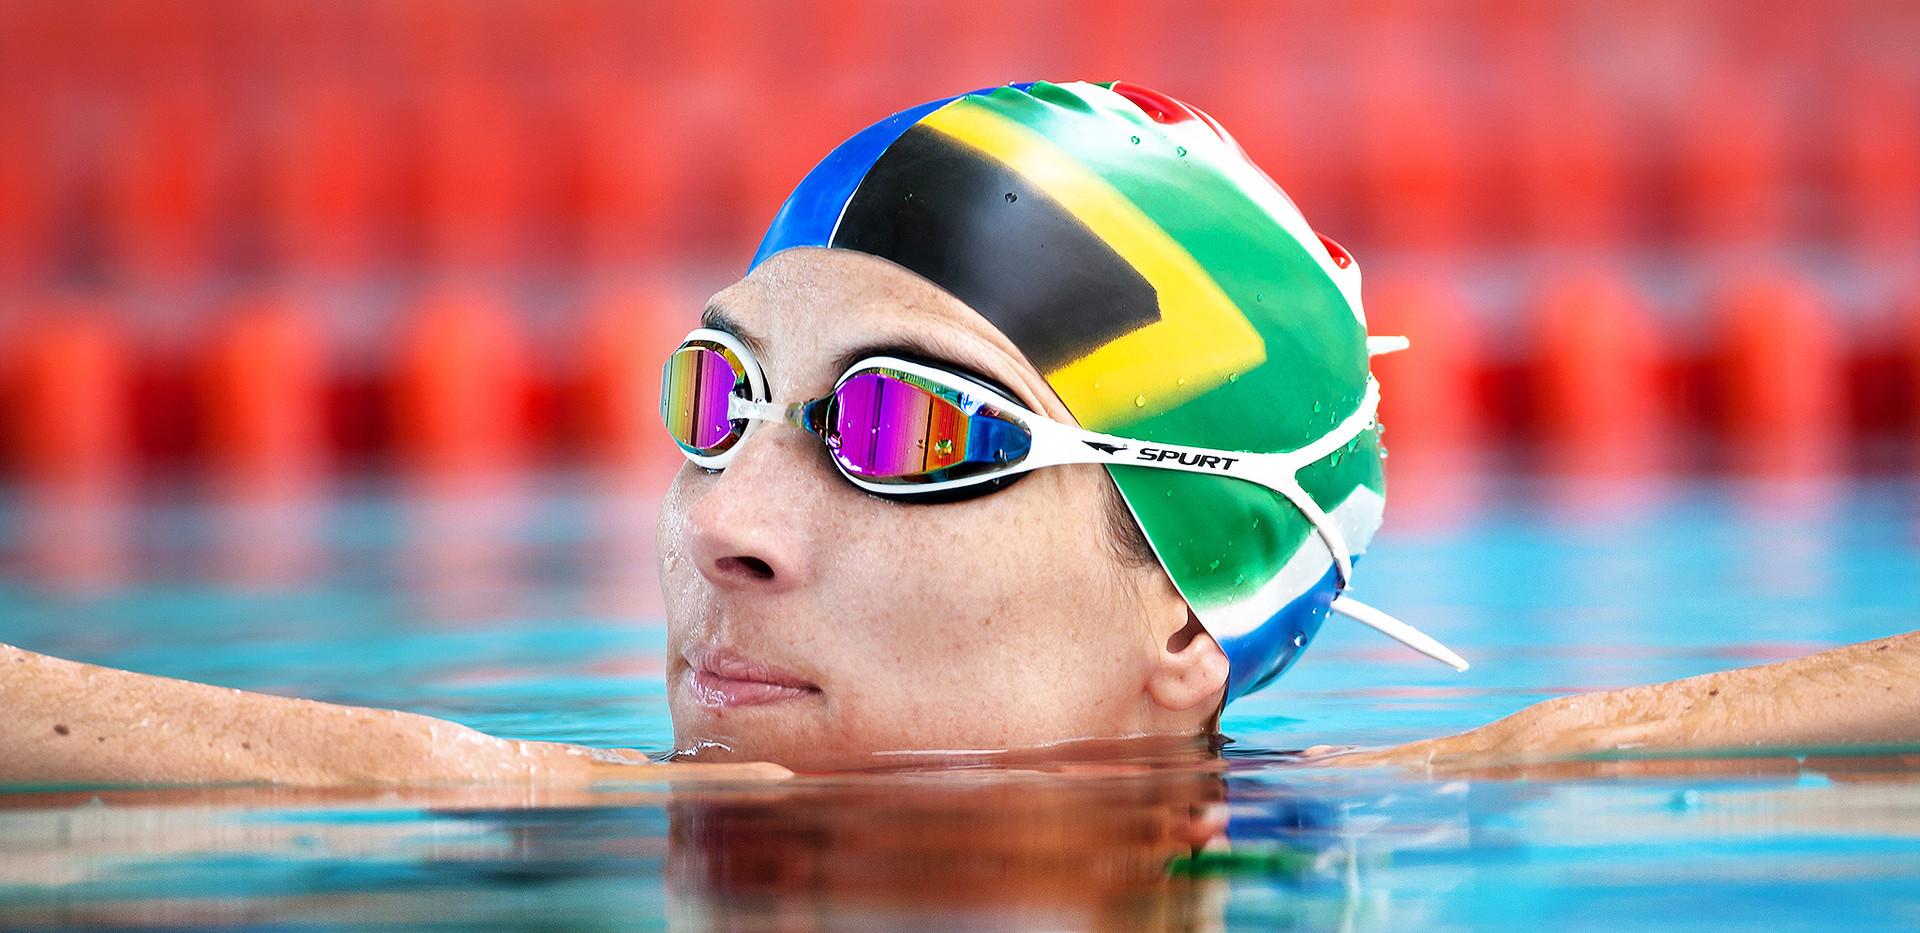 004_snr7707swimming14cestari_m 2048.jpg